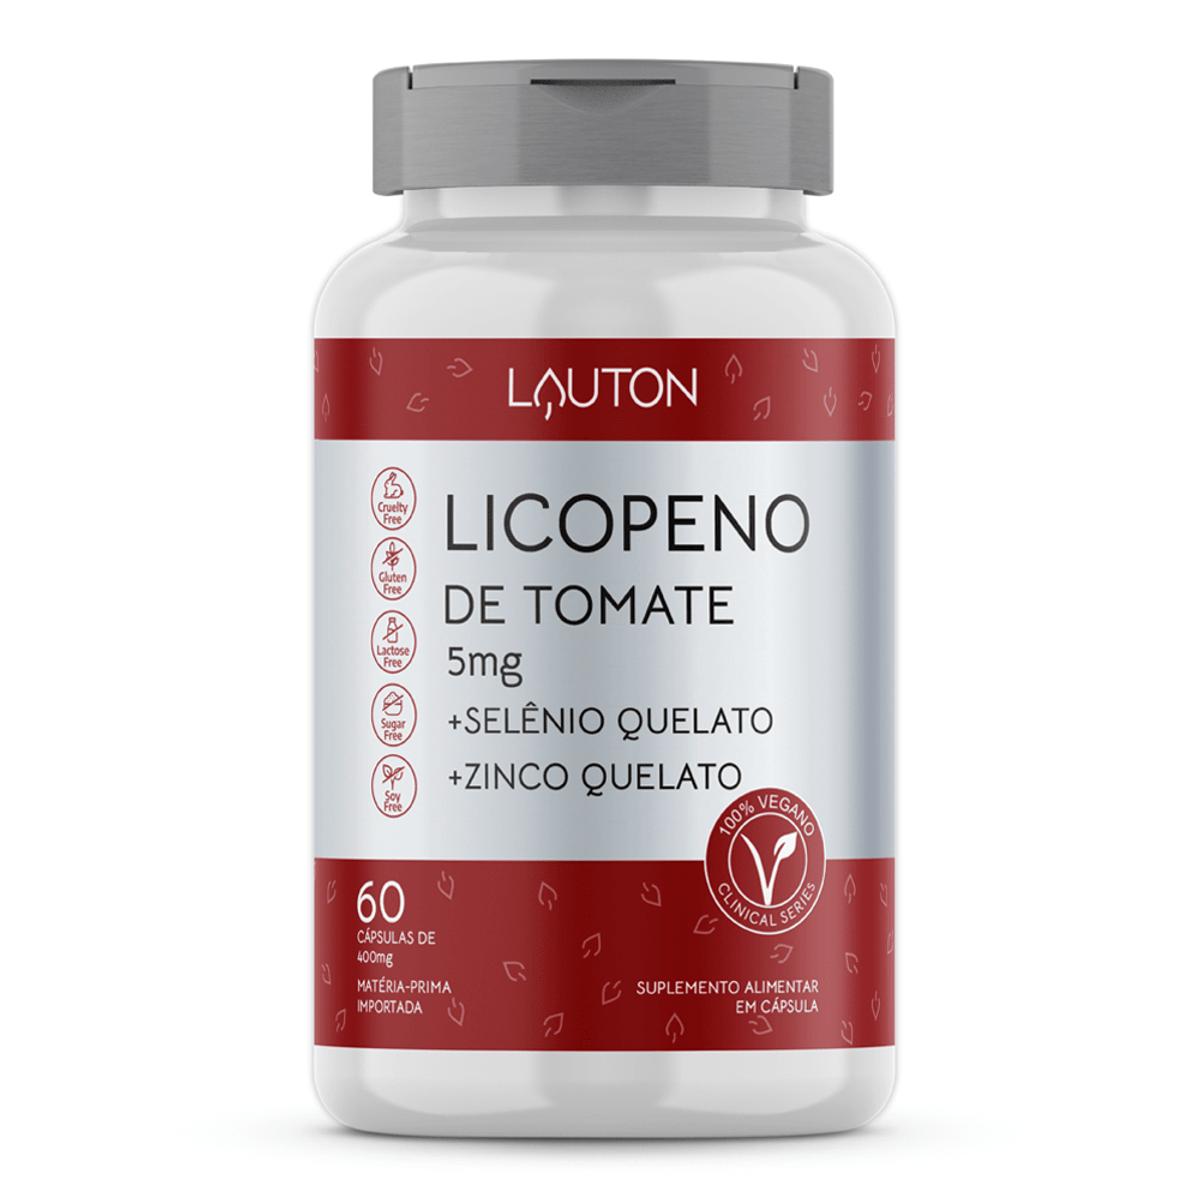 Licopeno 5mg - 60 Cápsulas - Lauton Nutrition